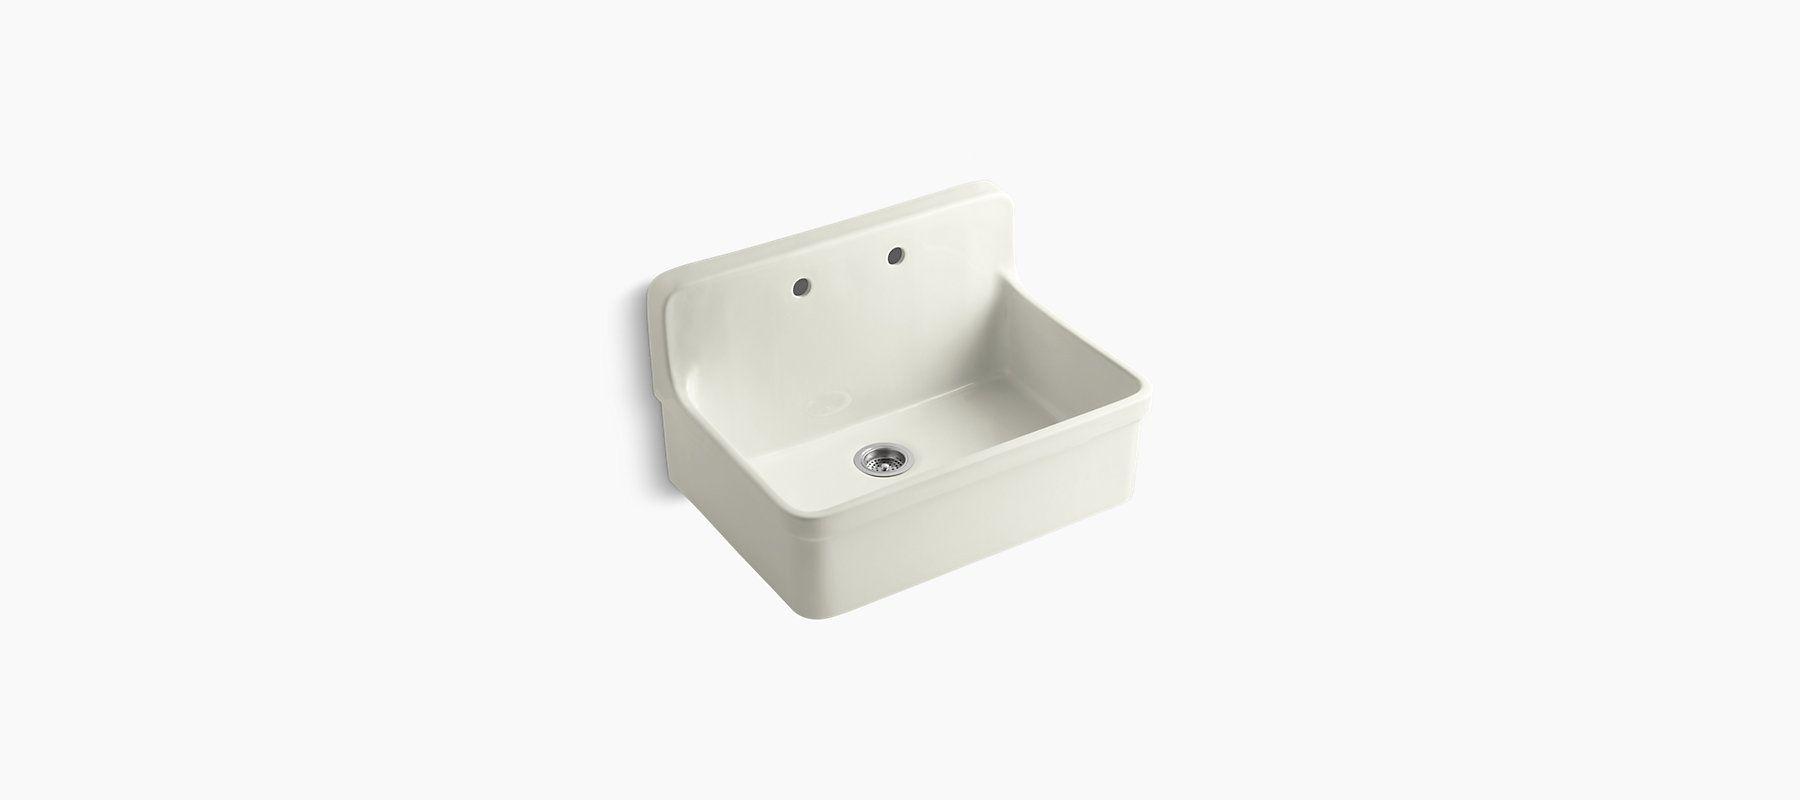 An Integrated Backsplash And Apron Give The K 12700 Kitchen Sink A Vintage Apron Front Kitchen Sink Sink Single Bowl Kitchen Sink